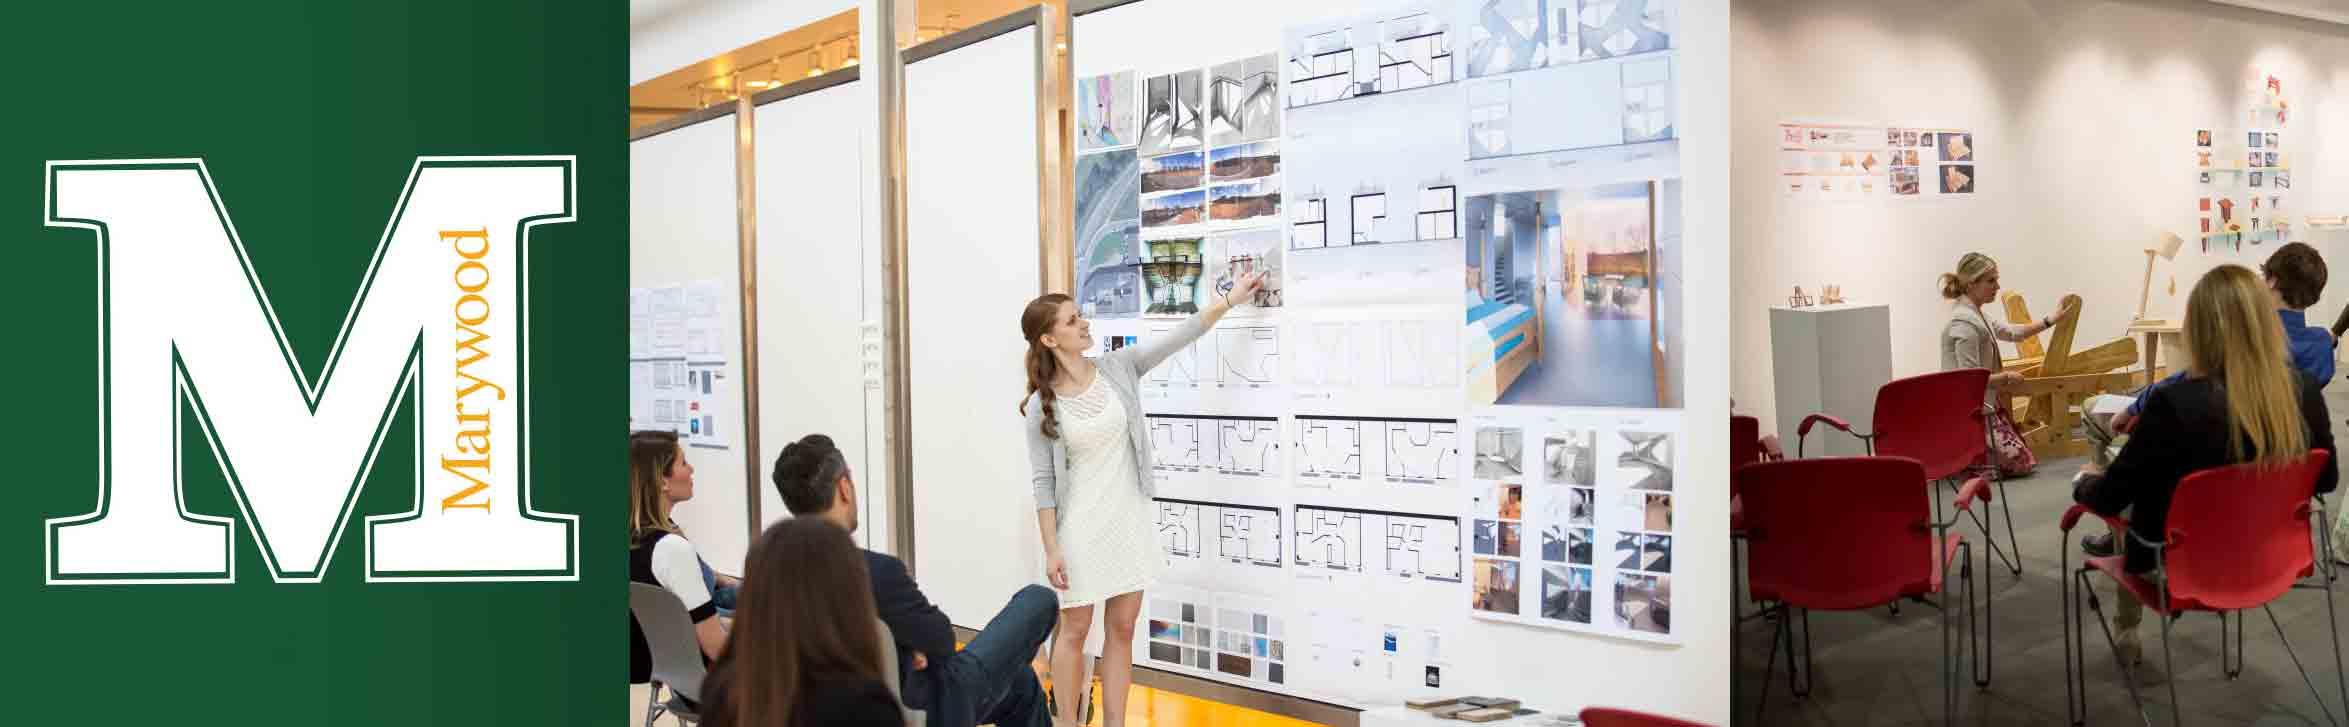 Marywood University School of Architecture